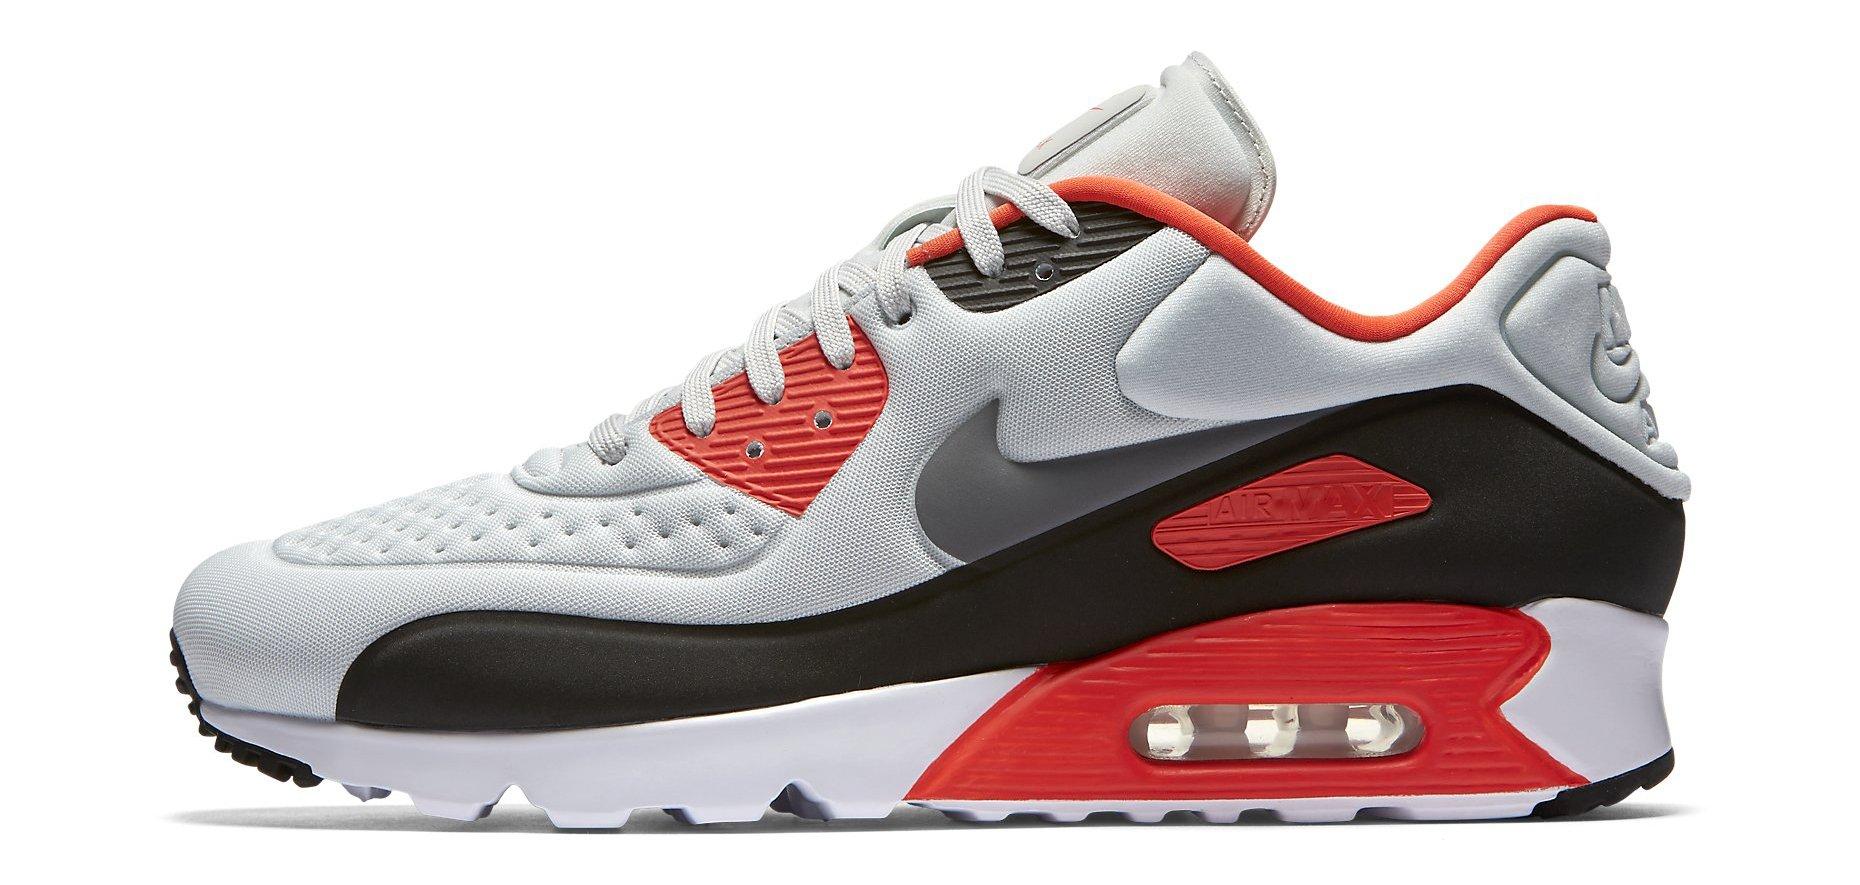 Obuv Nike AIR MAX 90 ULTRA SE 49abd442afb